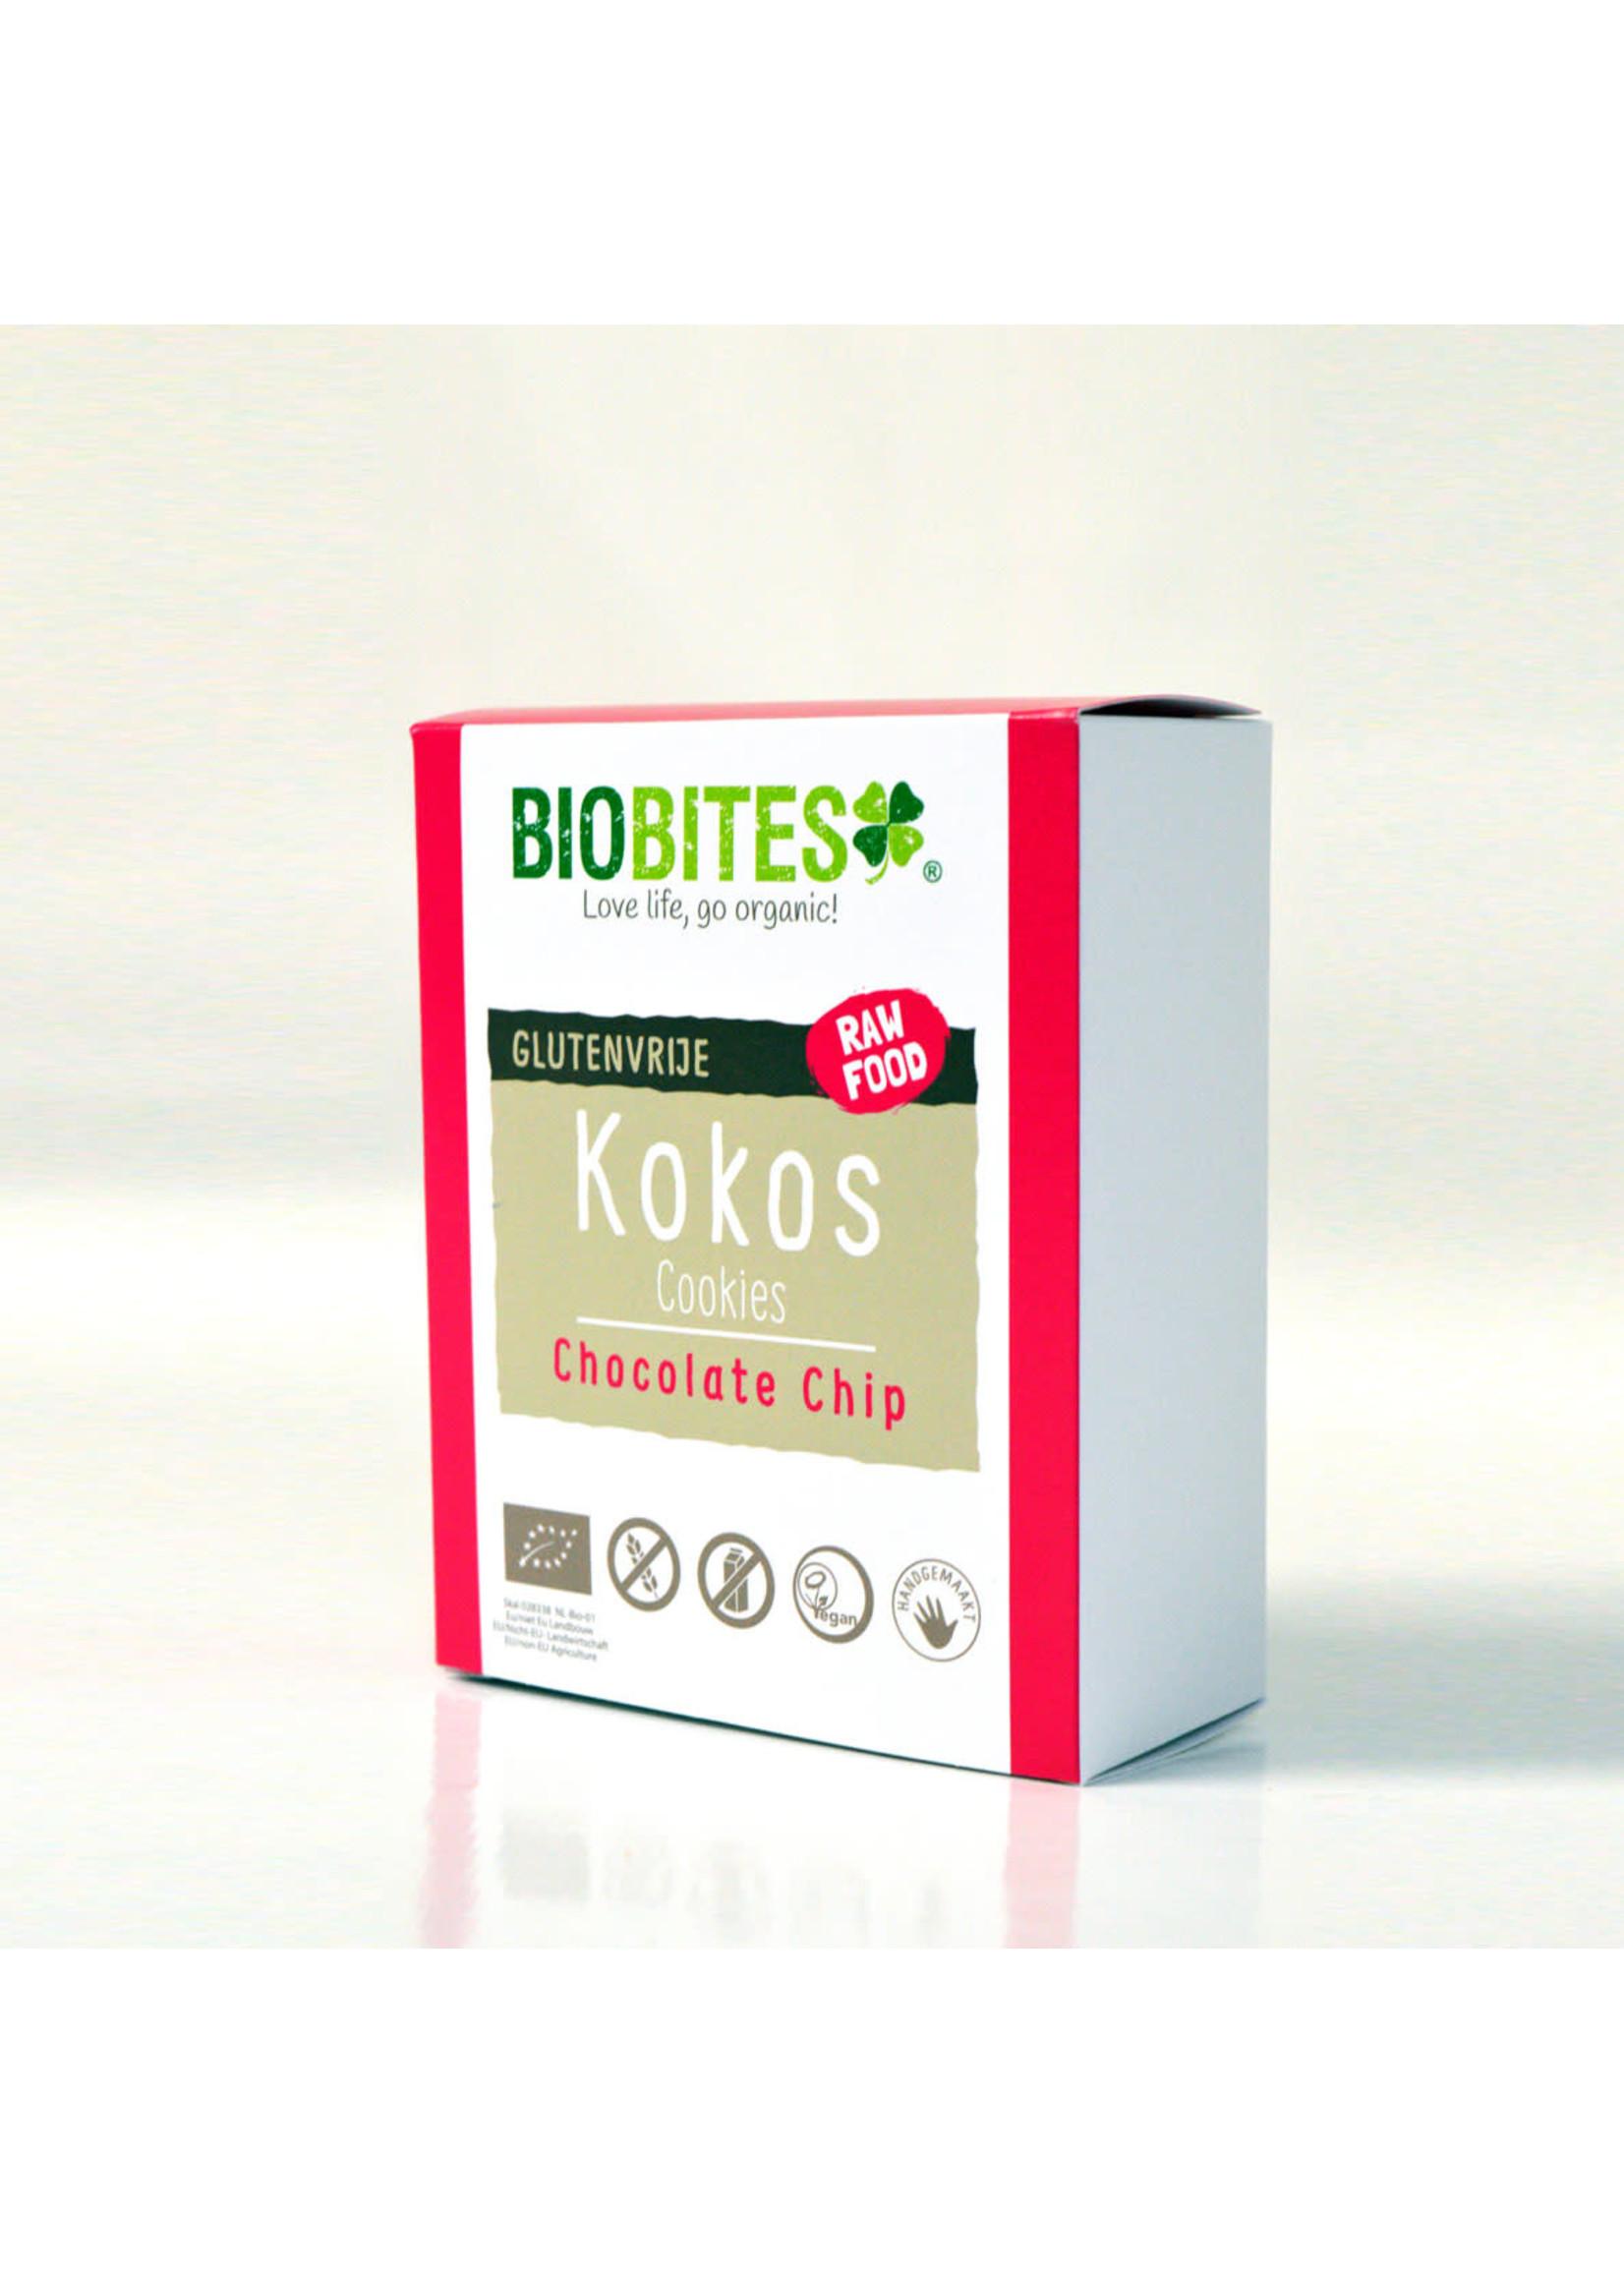 Biobites Koekjes Biobites